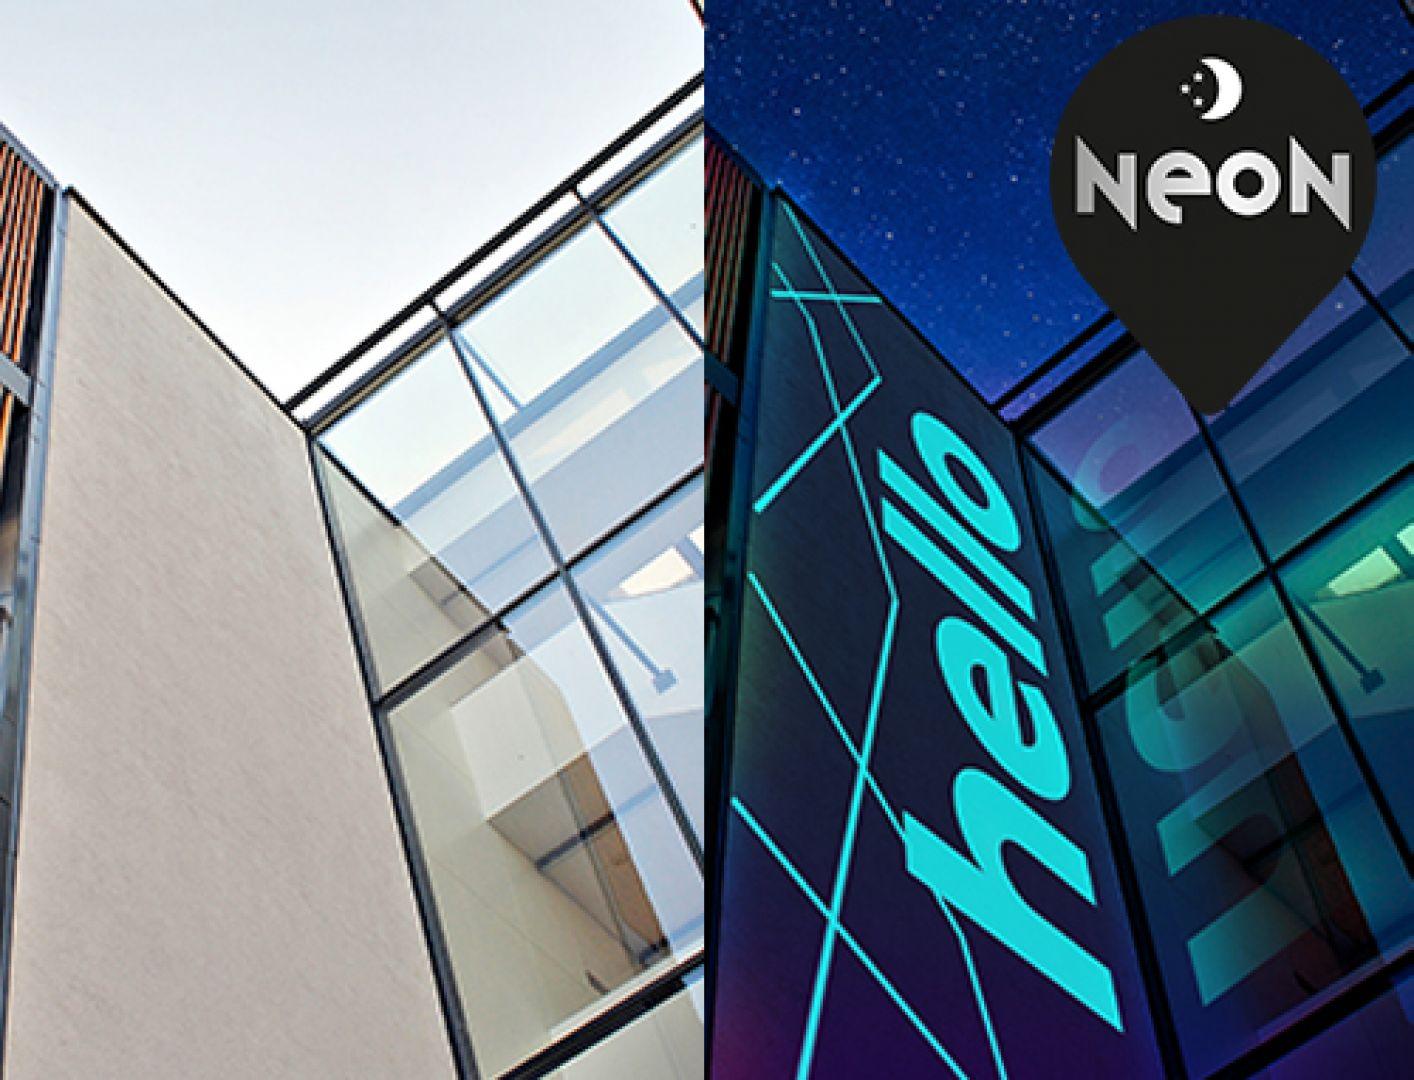 TOPDOM weber NEON ponoci sijoca fasada